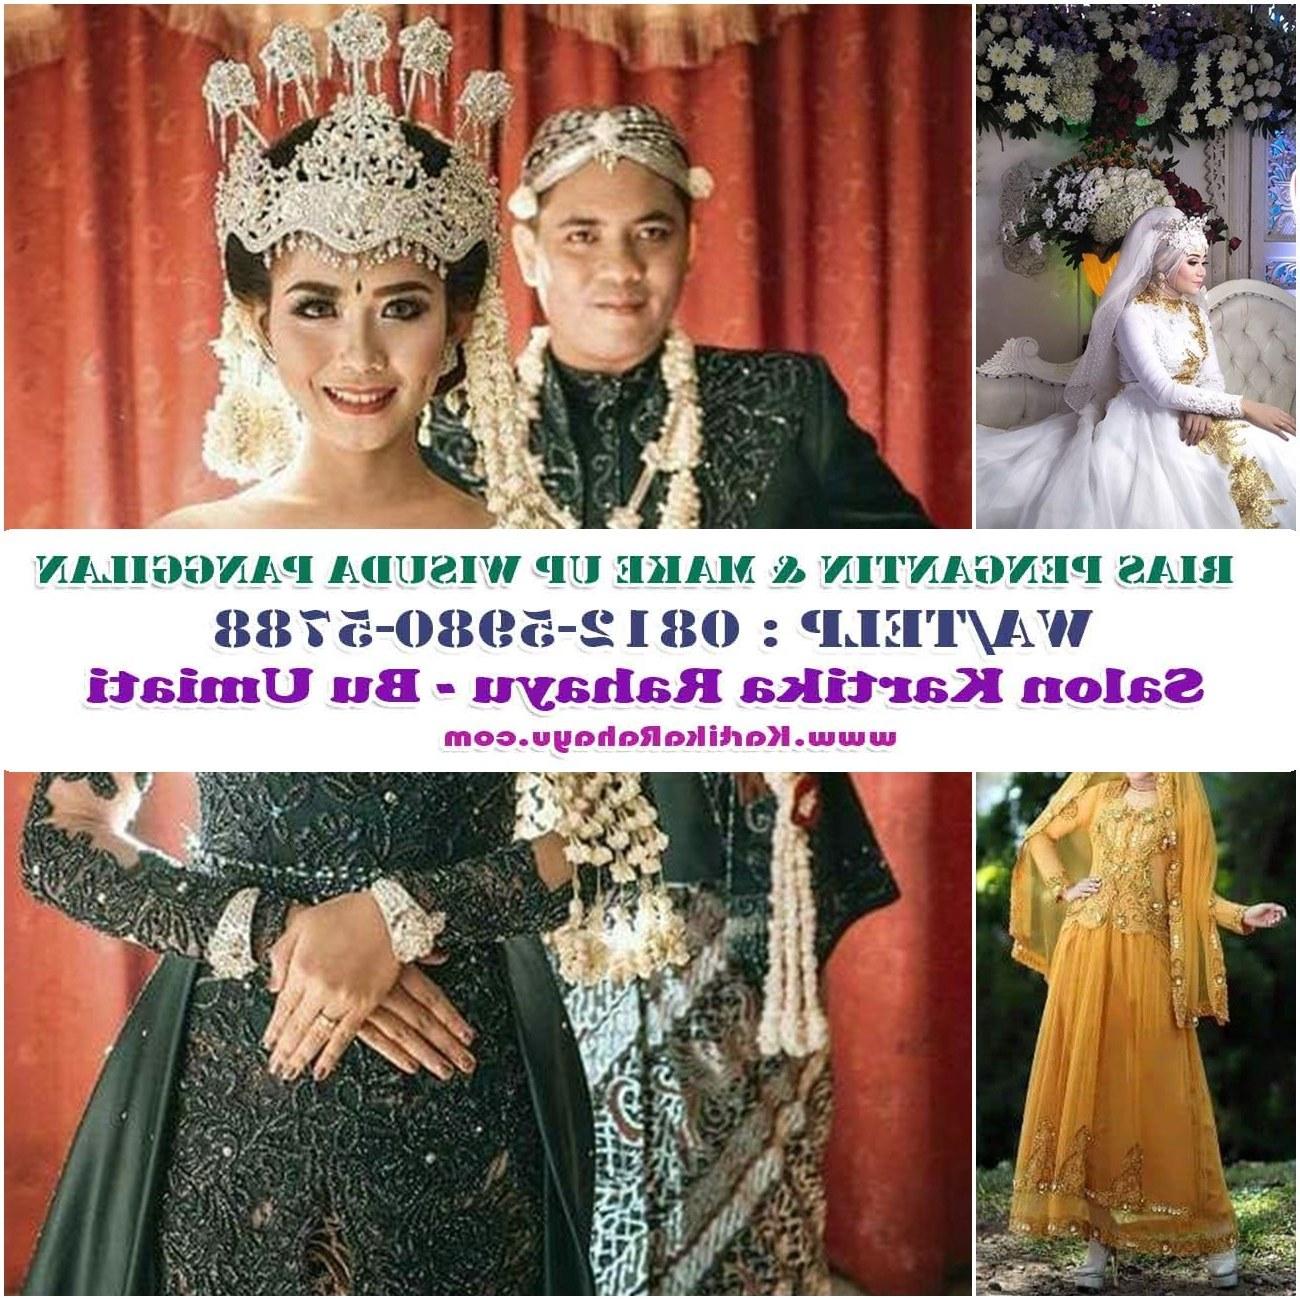 Ide Sewa Baju Pengantin Muslimah Bandung Ffdn Make Up Wisuda Malang Kota Malang Jawa Timur